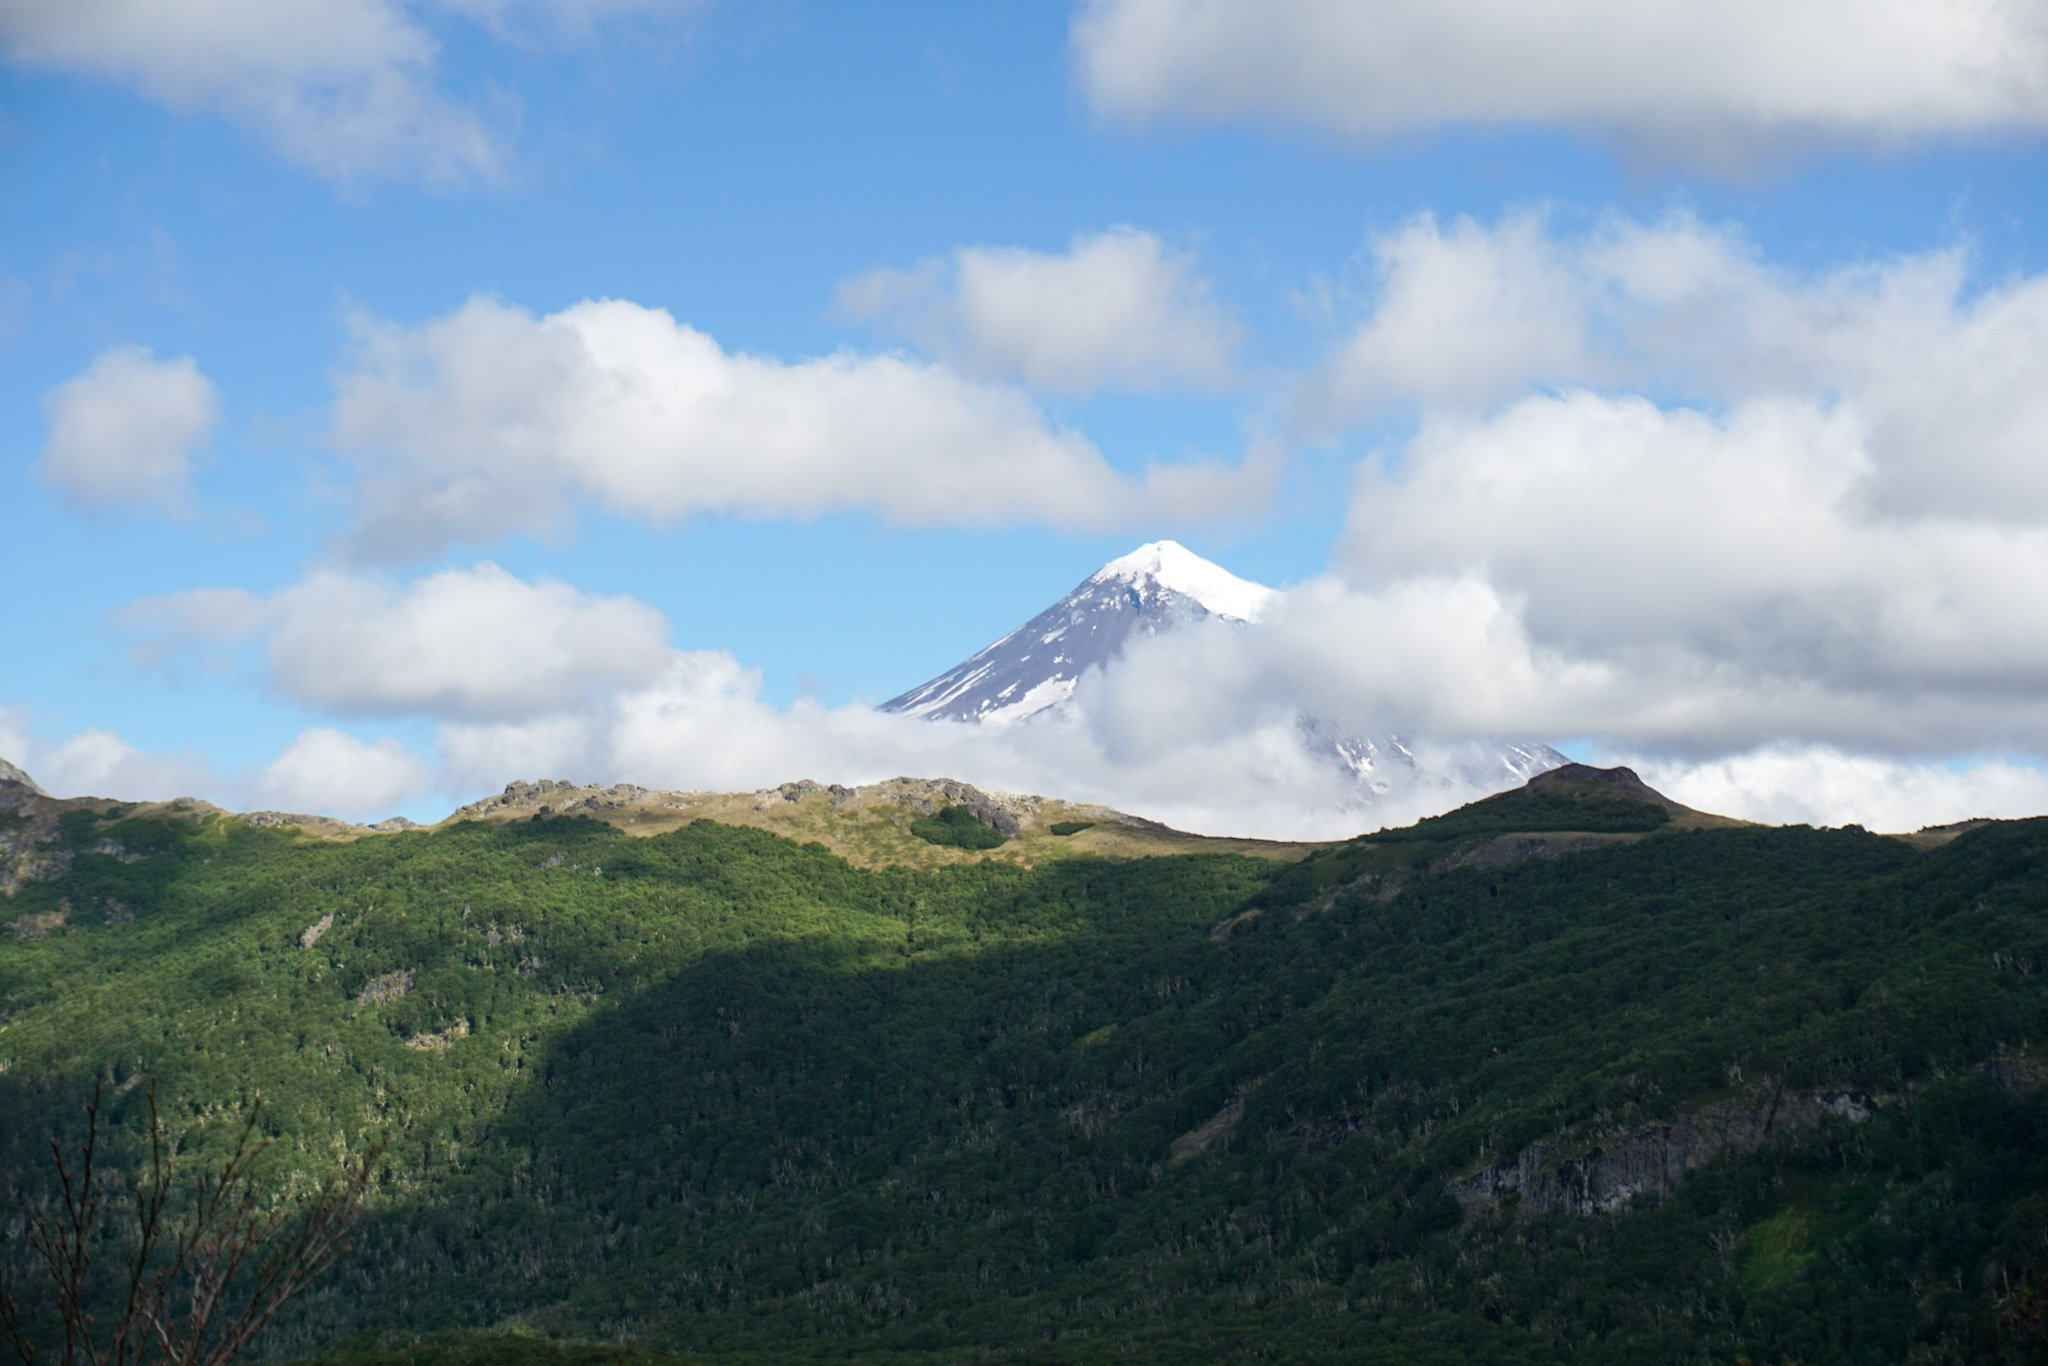 Chile_Pucon_Patagonia_Parque Nacional Villarrica